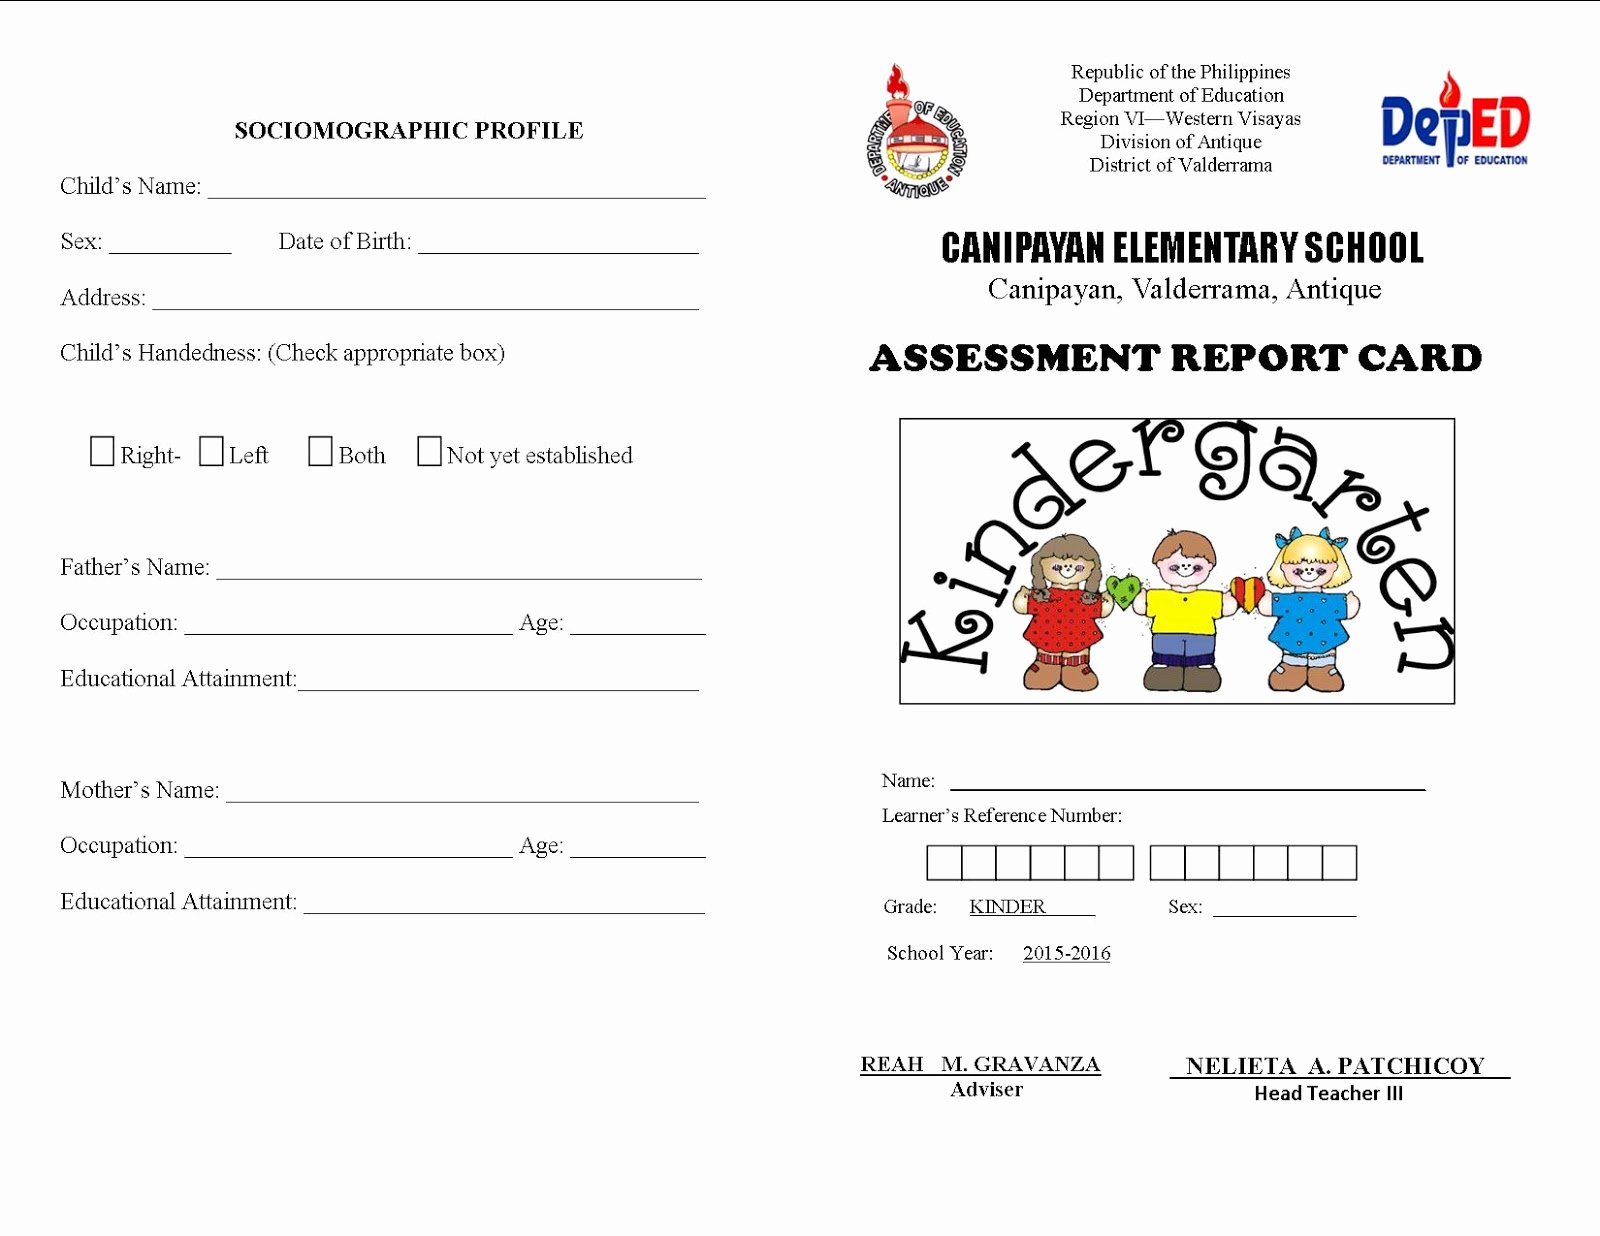 Kindergarten Report Card Template New Kinder assessment Report Card Deped Lp S